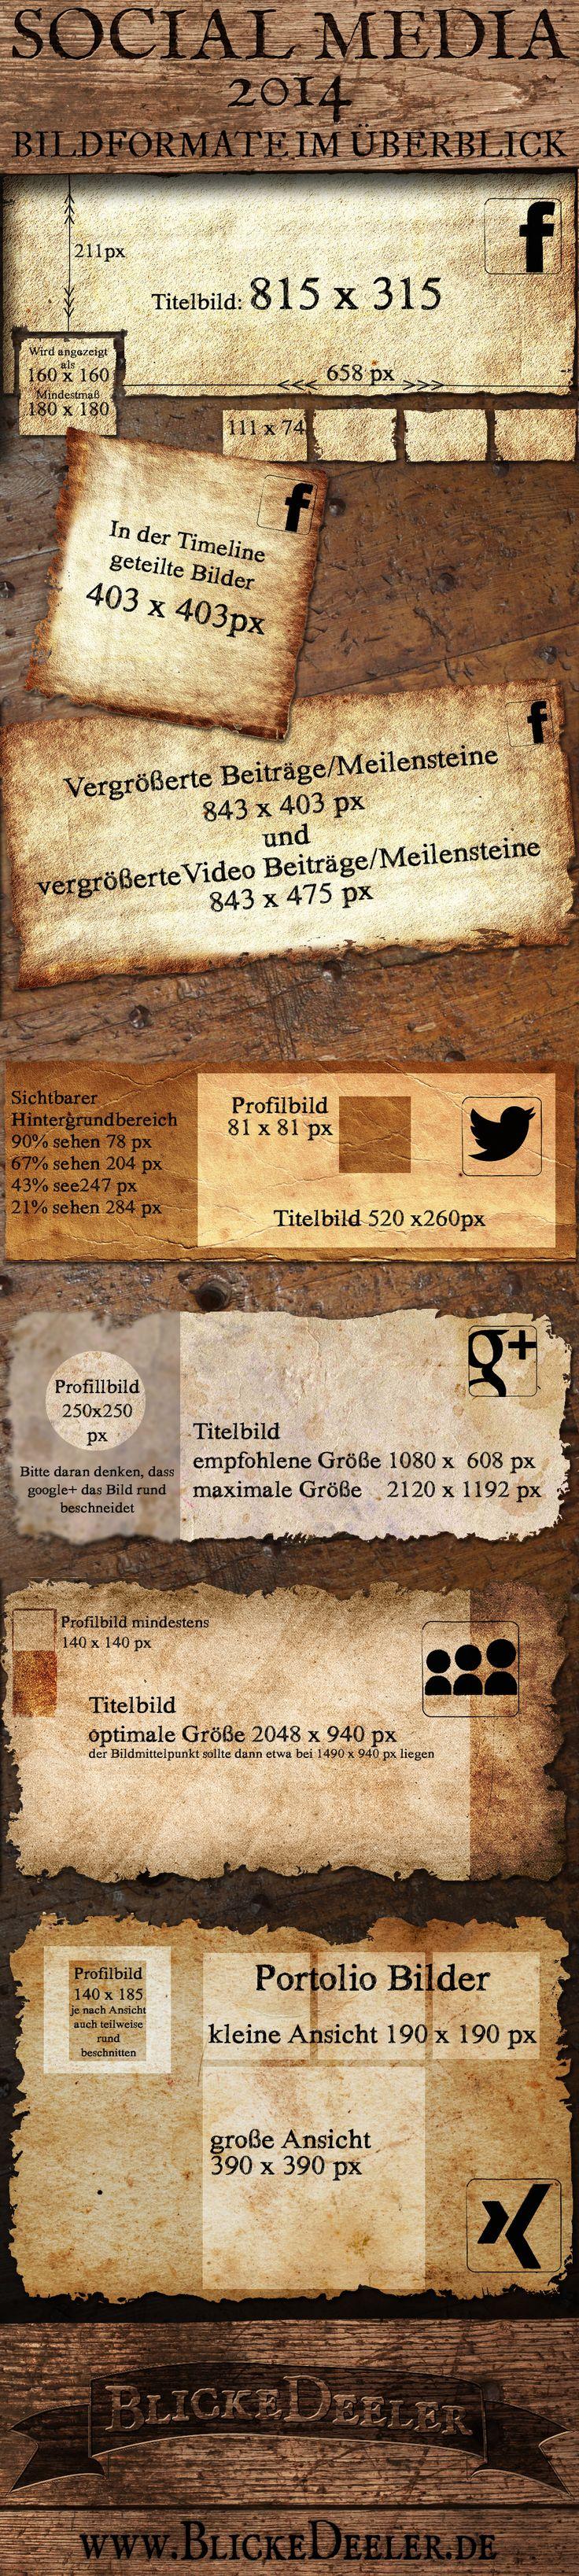 BlickeDeeler: SocialMedia Bildgröße - Infografik   #infographic #marketing #socialmedia #sizesheet  #myspace #xing #facebook #google+ #community #business #illustration #information #design < designed and pinned by www.BlickeDeeler.de